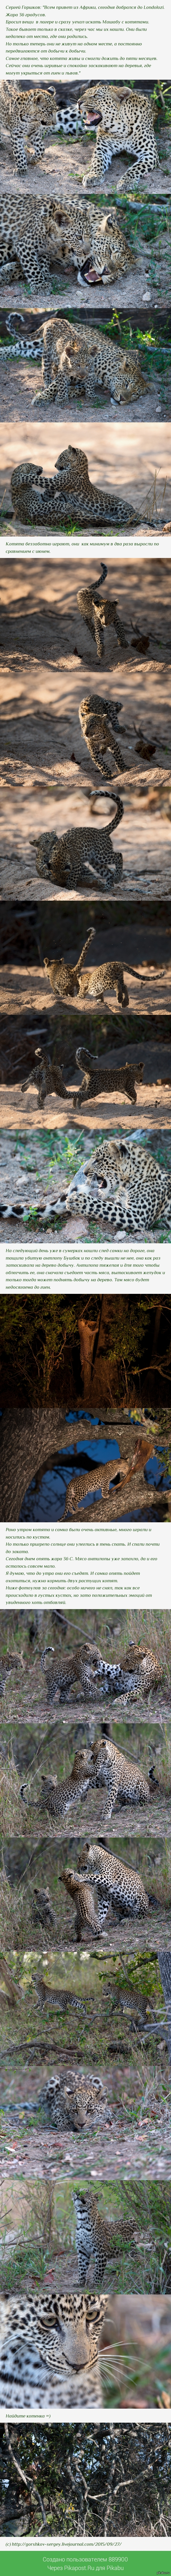 "Семейство леопардов Начало тут: <a href=""http://pikabu.ru/story/_3477497"">http://pikabu.ru/story/_3477497</a>"